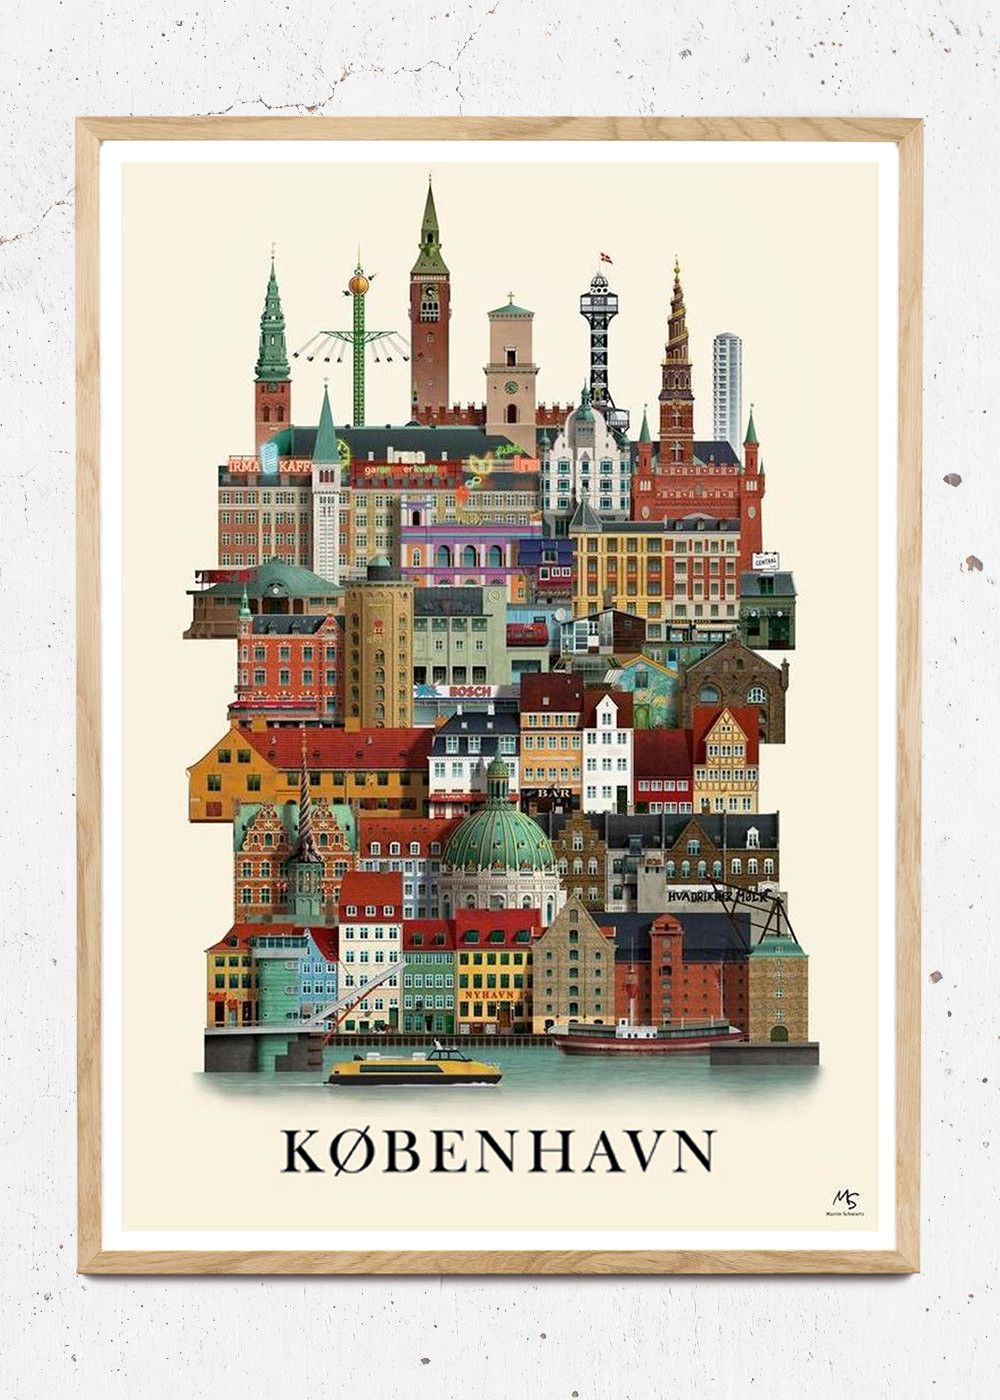 Ms Kobenhavn Plakater Rejseplakat Vintage Plakater